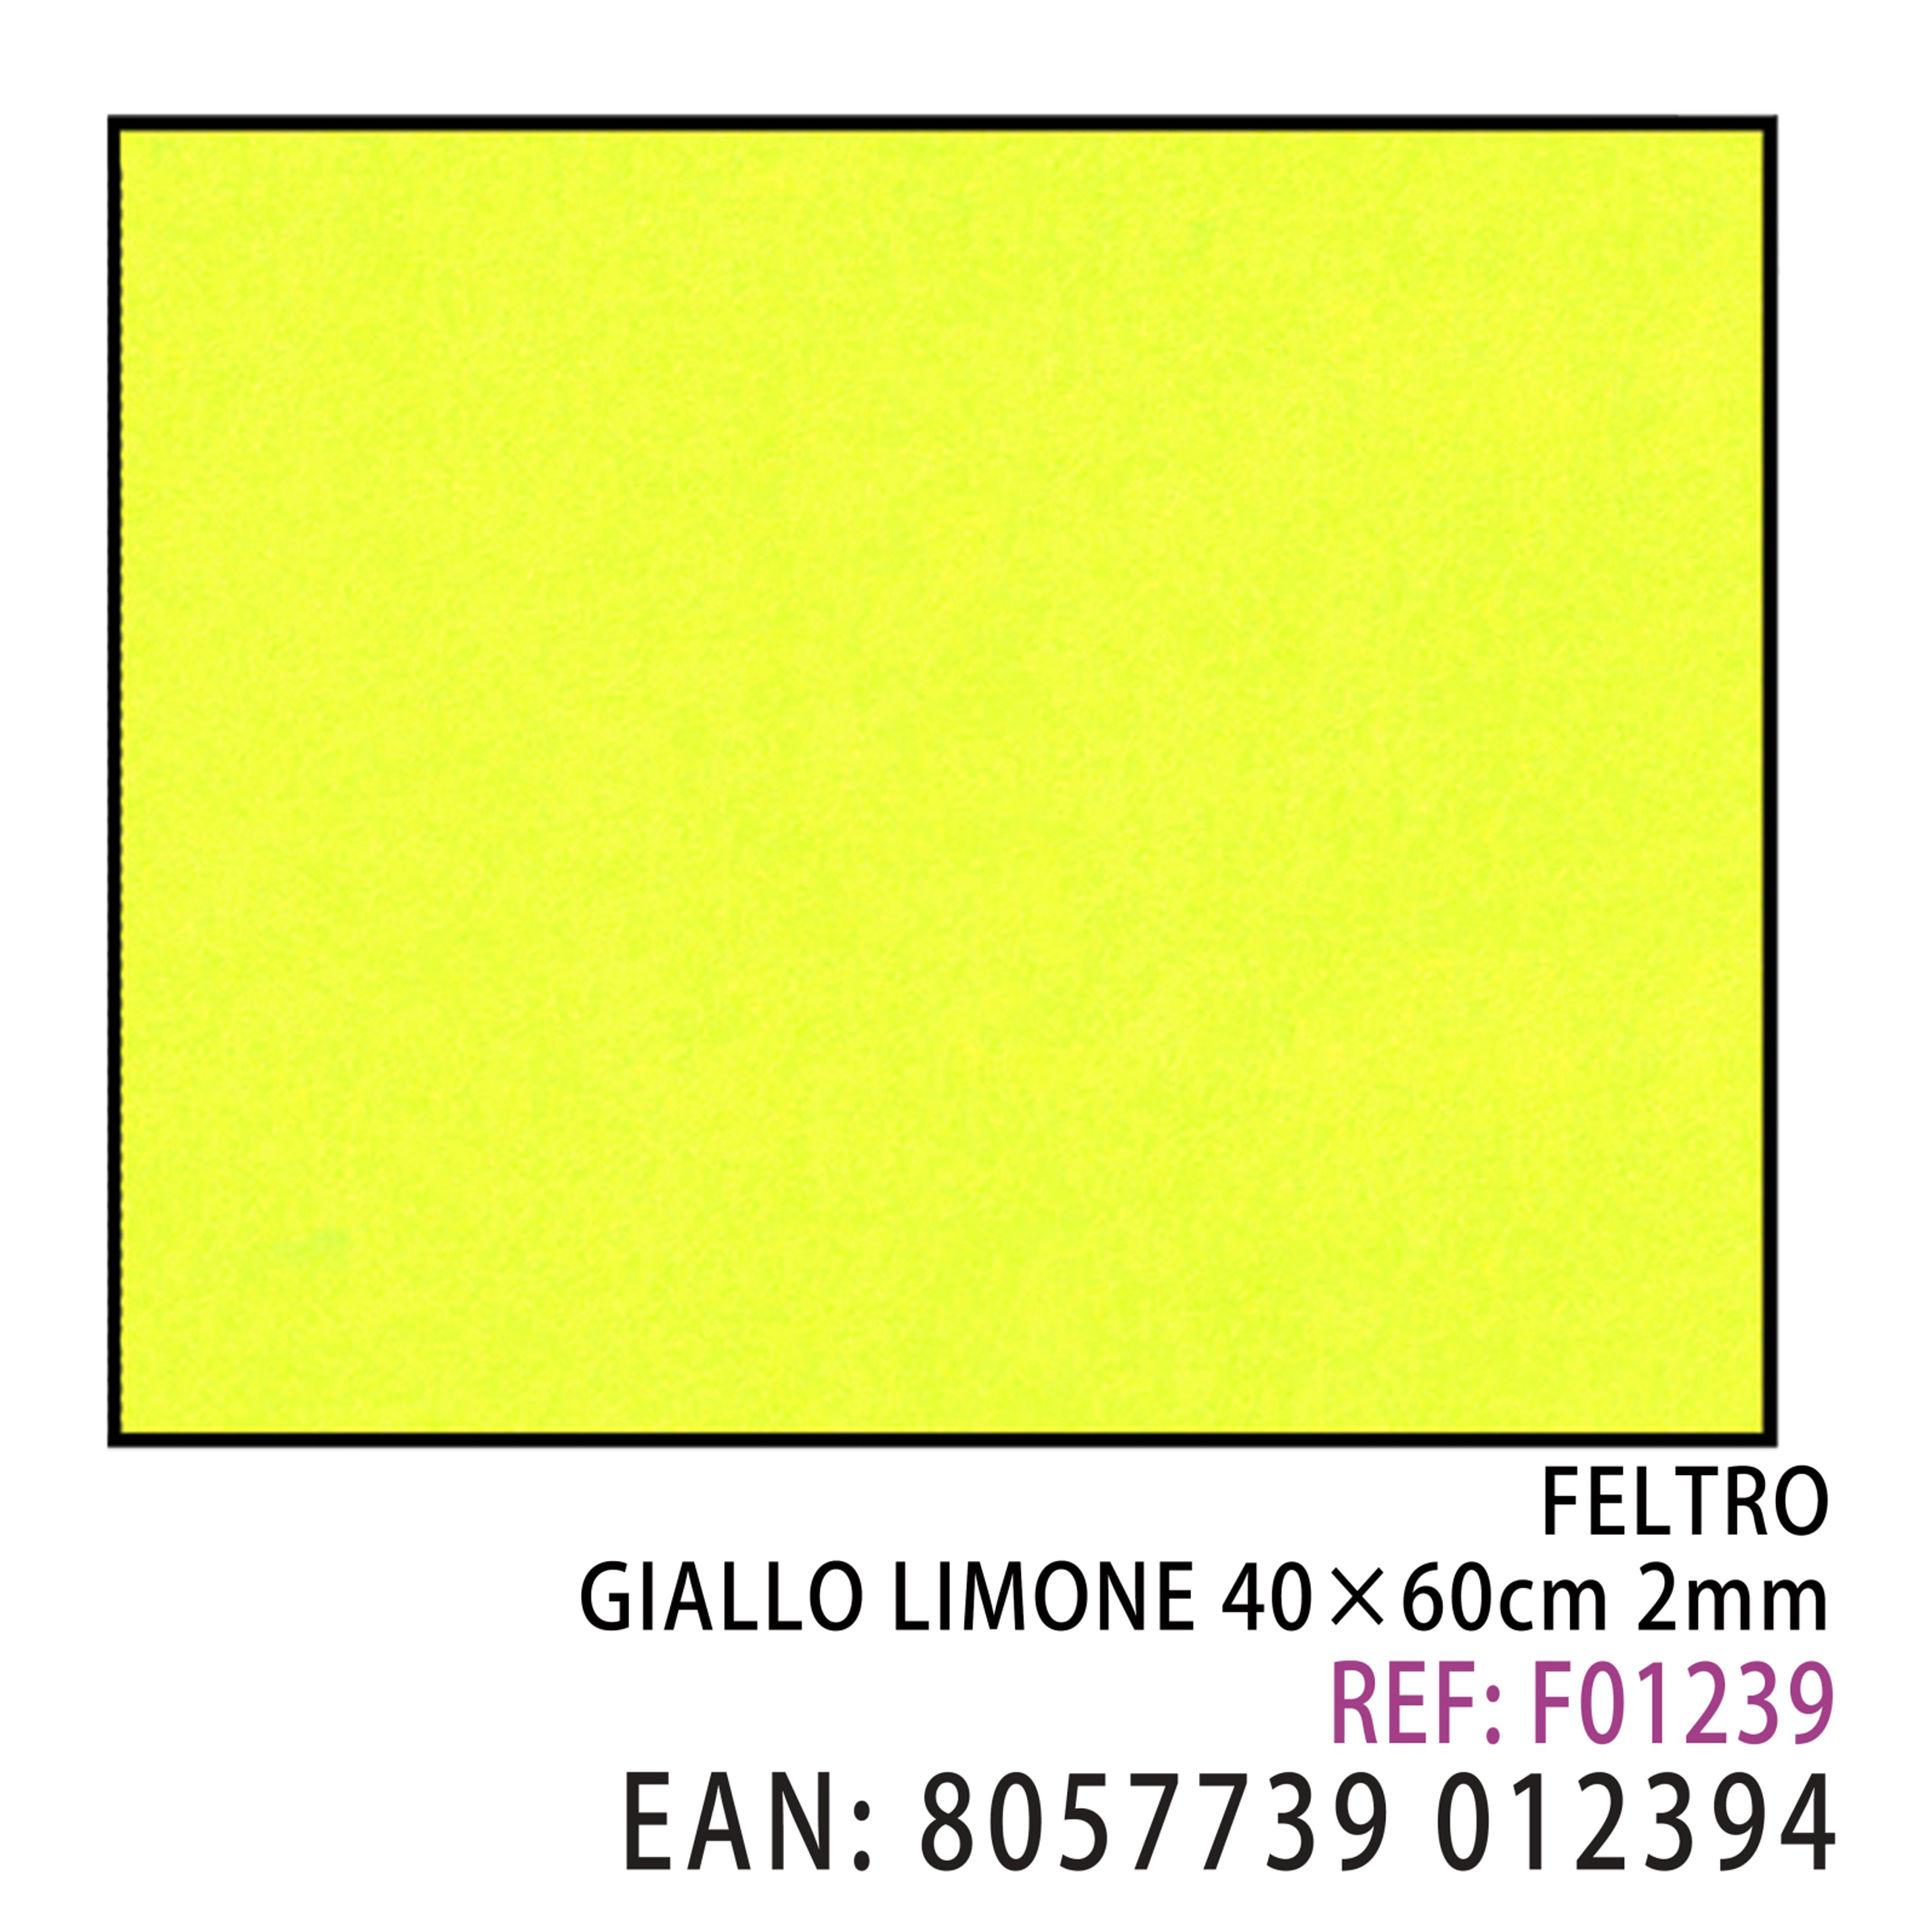 FELTRO GIALLO LIMONE 40*60CM*2MMDz